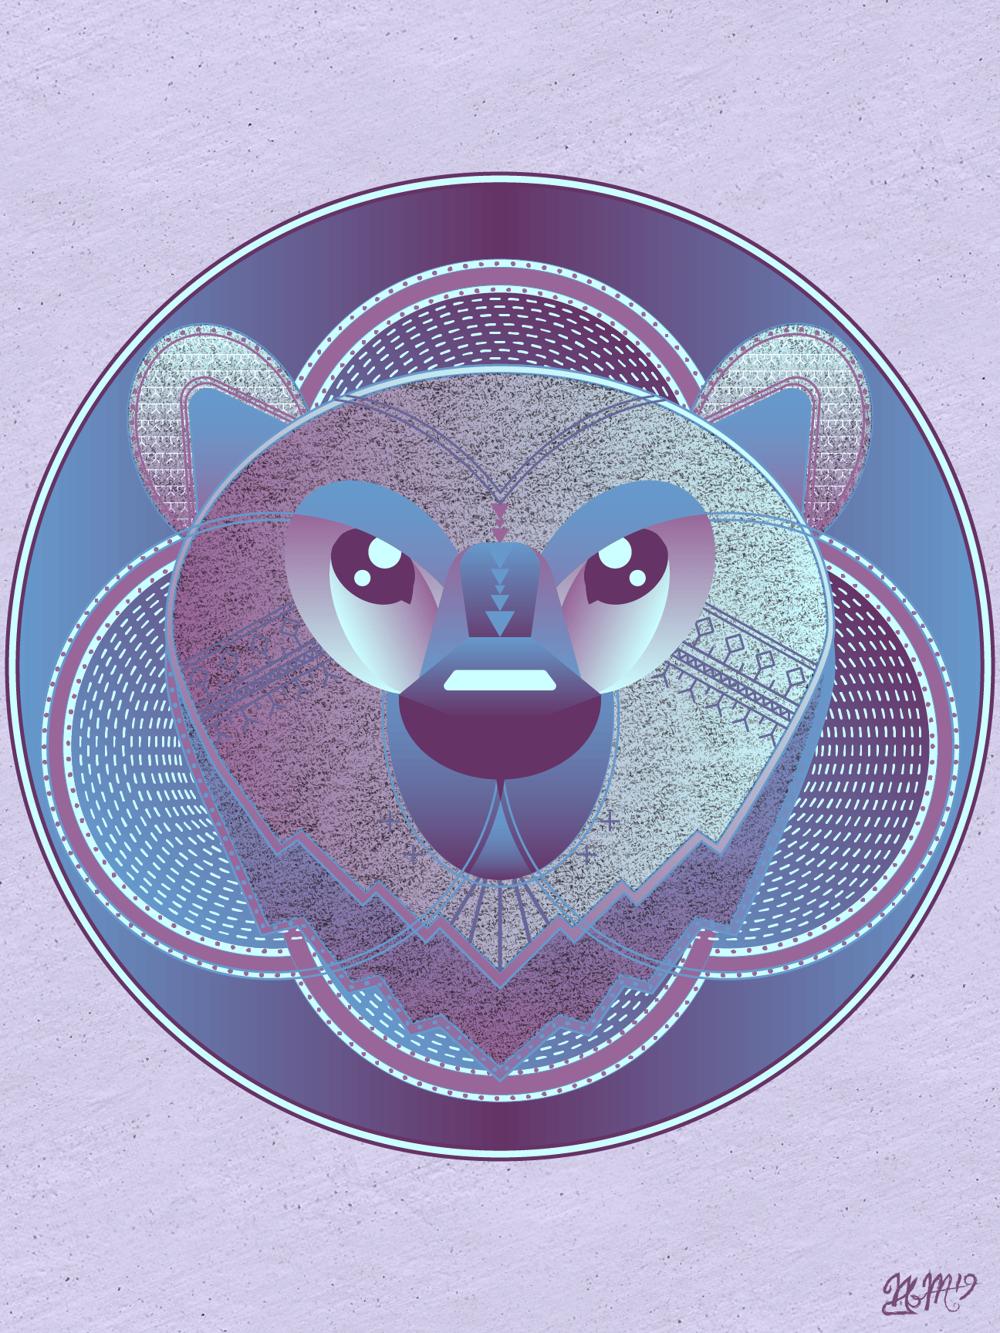 Polar Bear - image 8 - student project